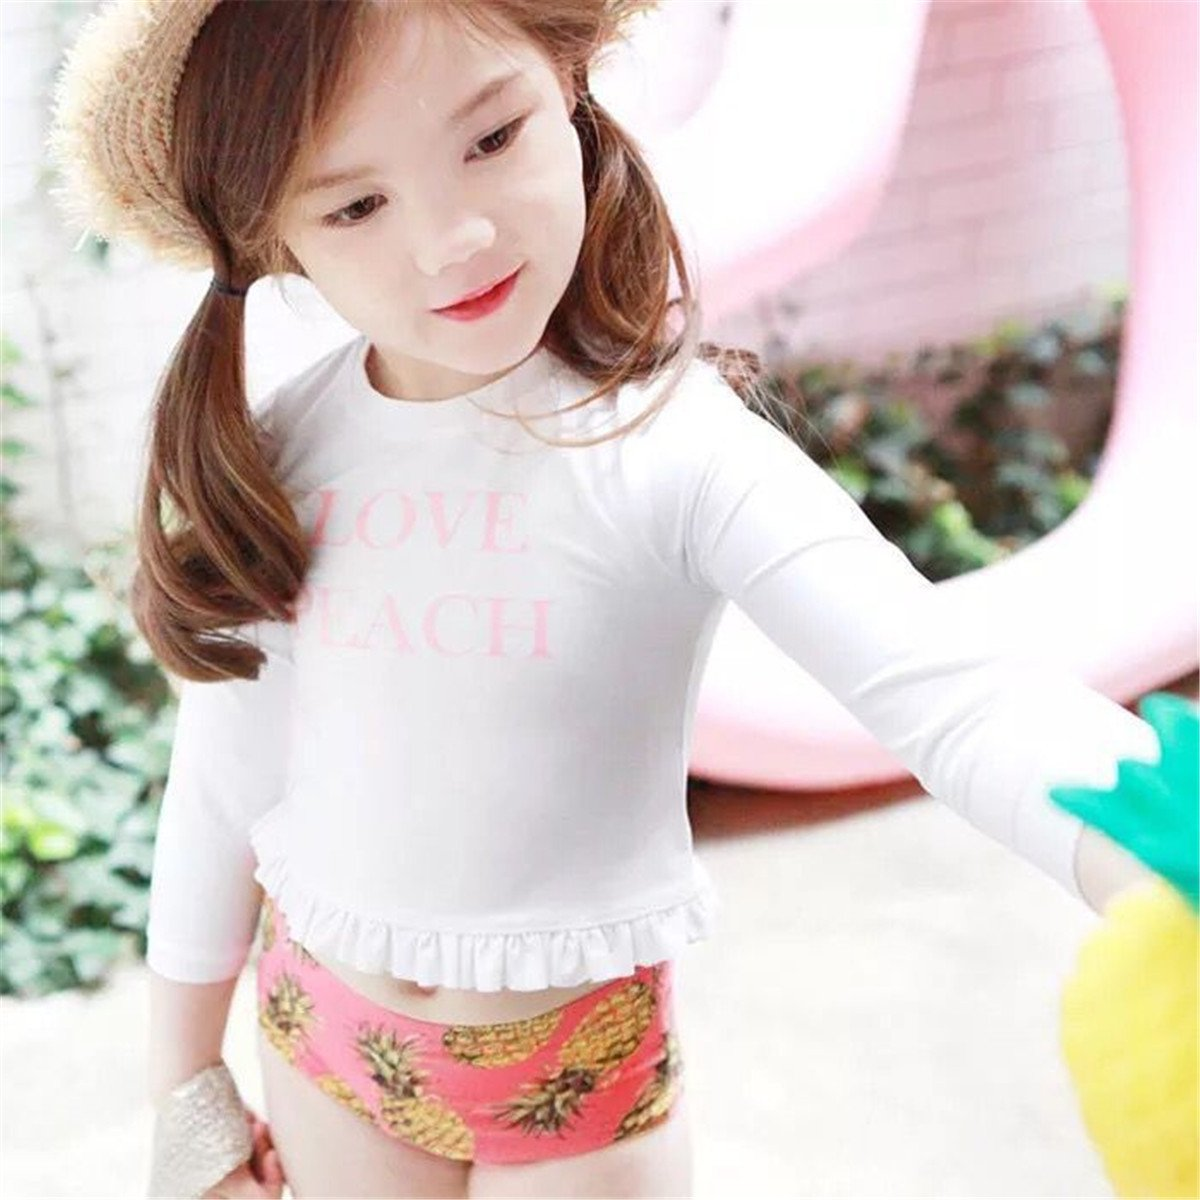 UV Swimsuits Beachwear Bathing Suits Little Girls Kids 2 Pieces Long-Sleeve Flamingo Swimwear Rash Guard UPF 50